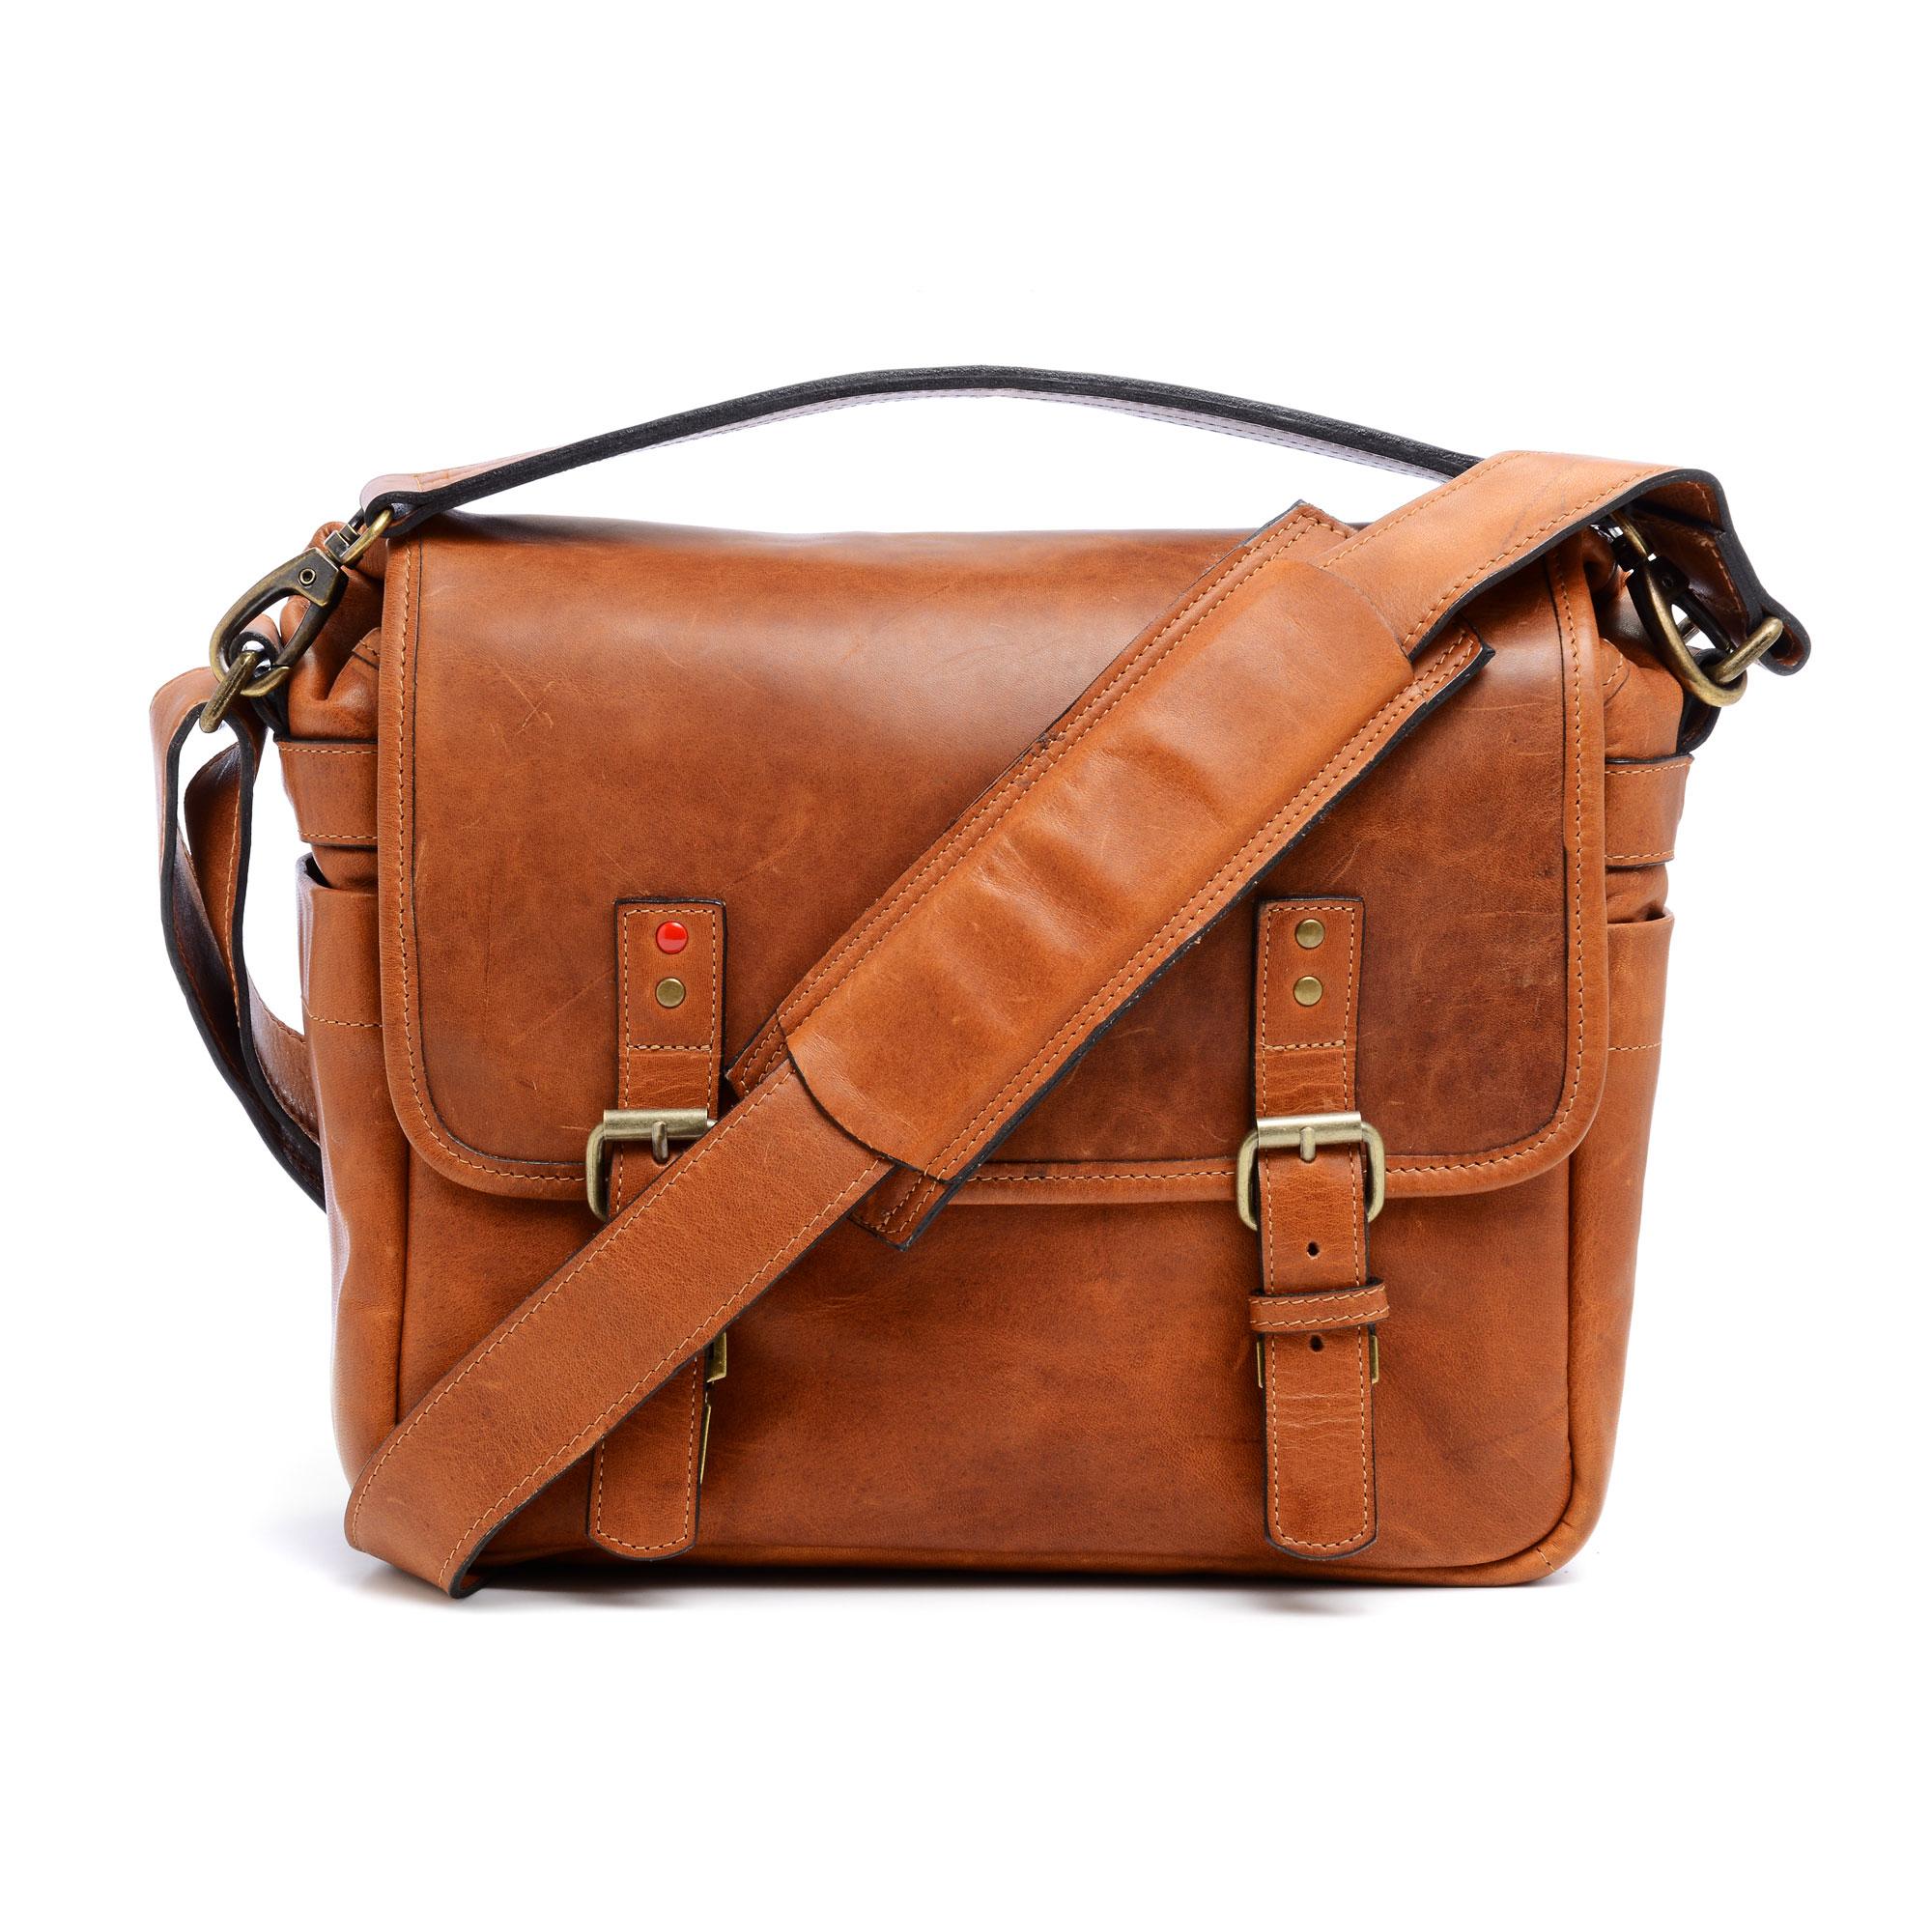 Image of Ona Bags The Berlin II Camera Messenger Bag (Vintage Bourbon)